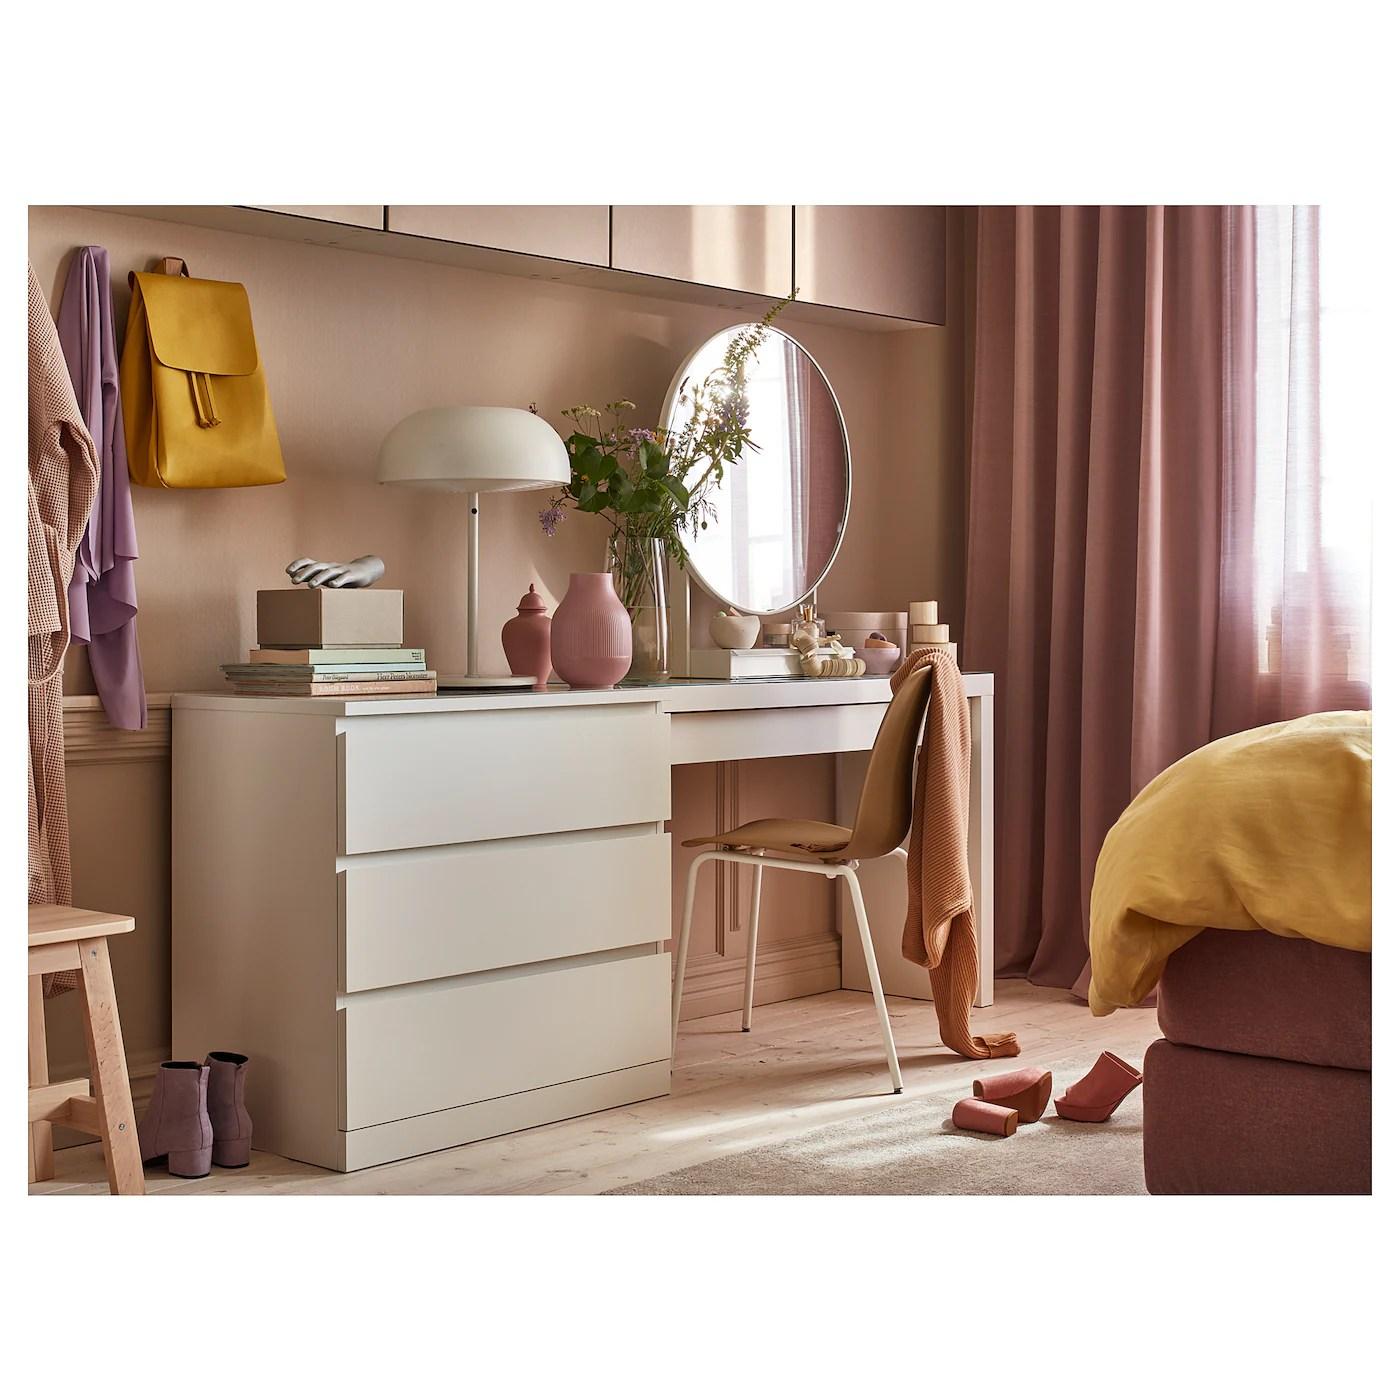 Malm Coiffeuse Blanc 120x41 Cm Ikea